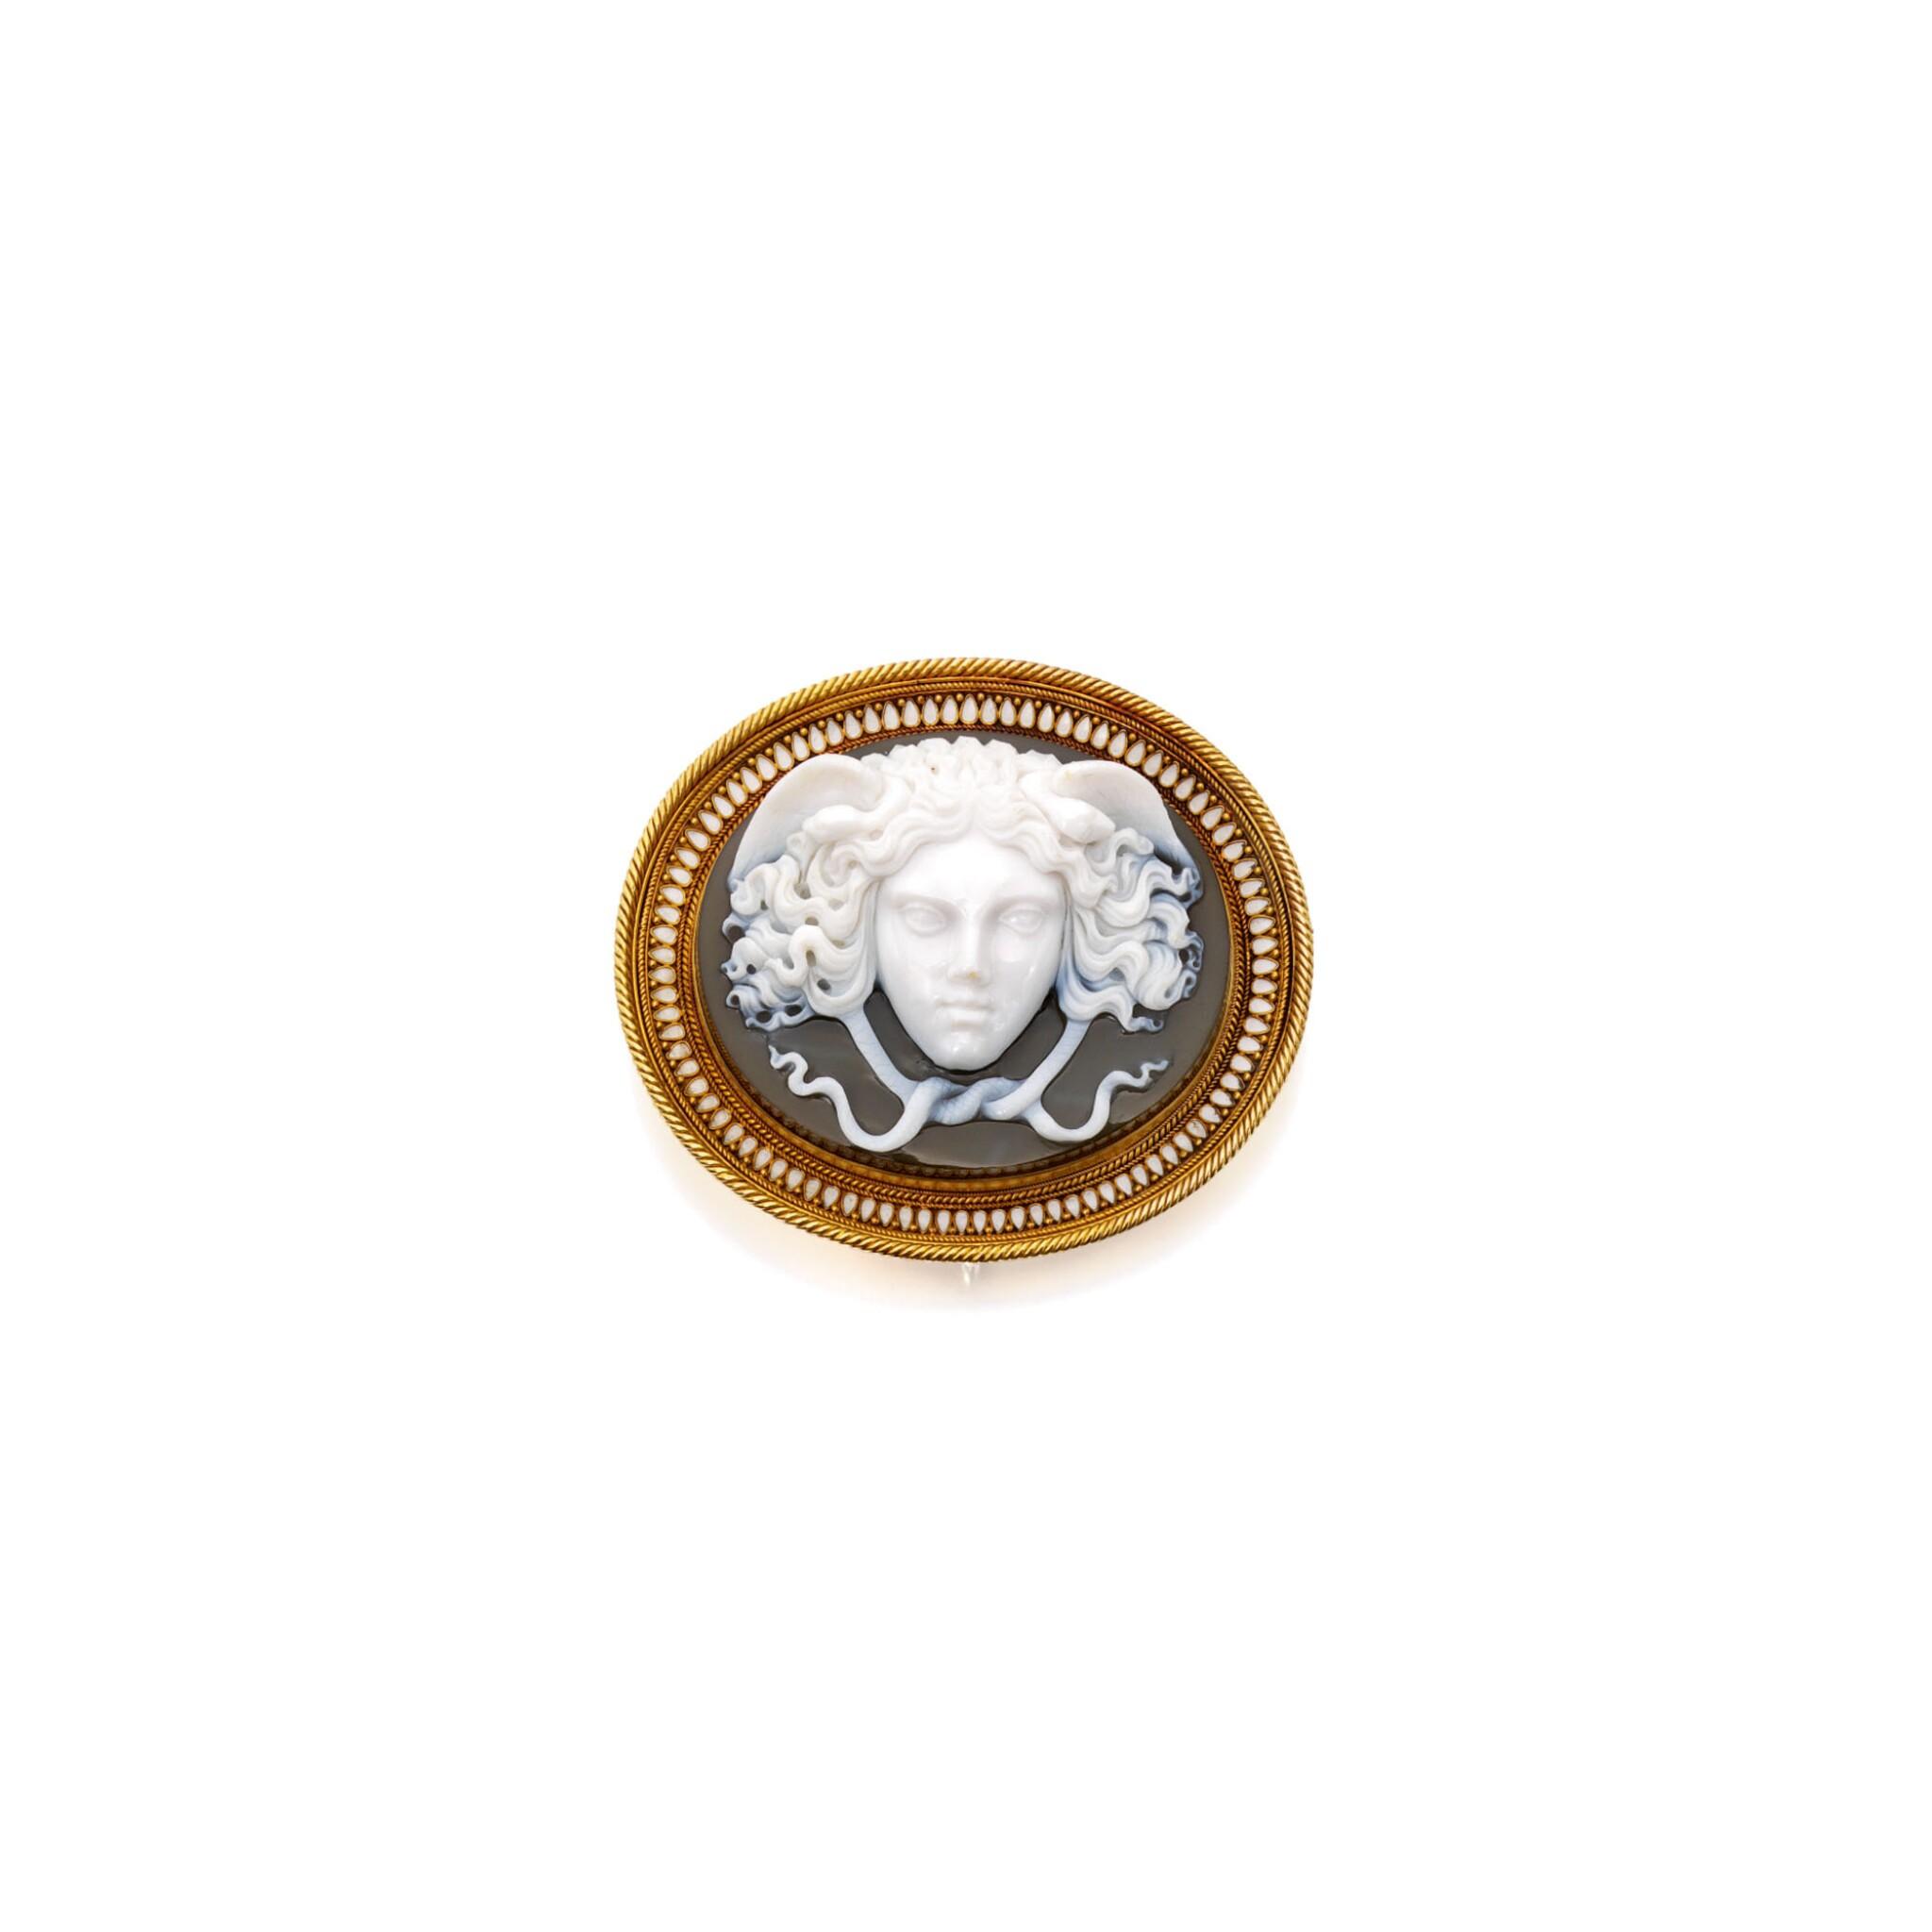 View full screen - View 1 of Lot 493. GOLD, CHALCEDONY AND ENAMEL BROOCH | 黃金鑲玉髓配琺瑯彩別針.